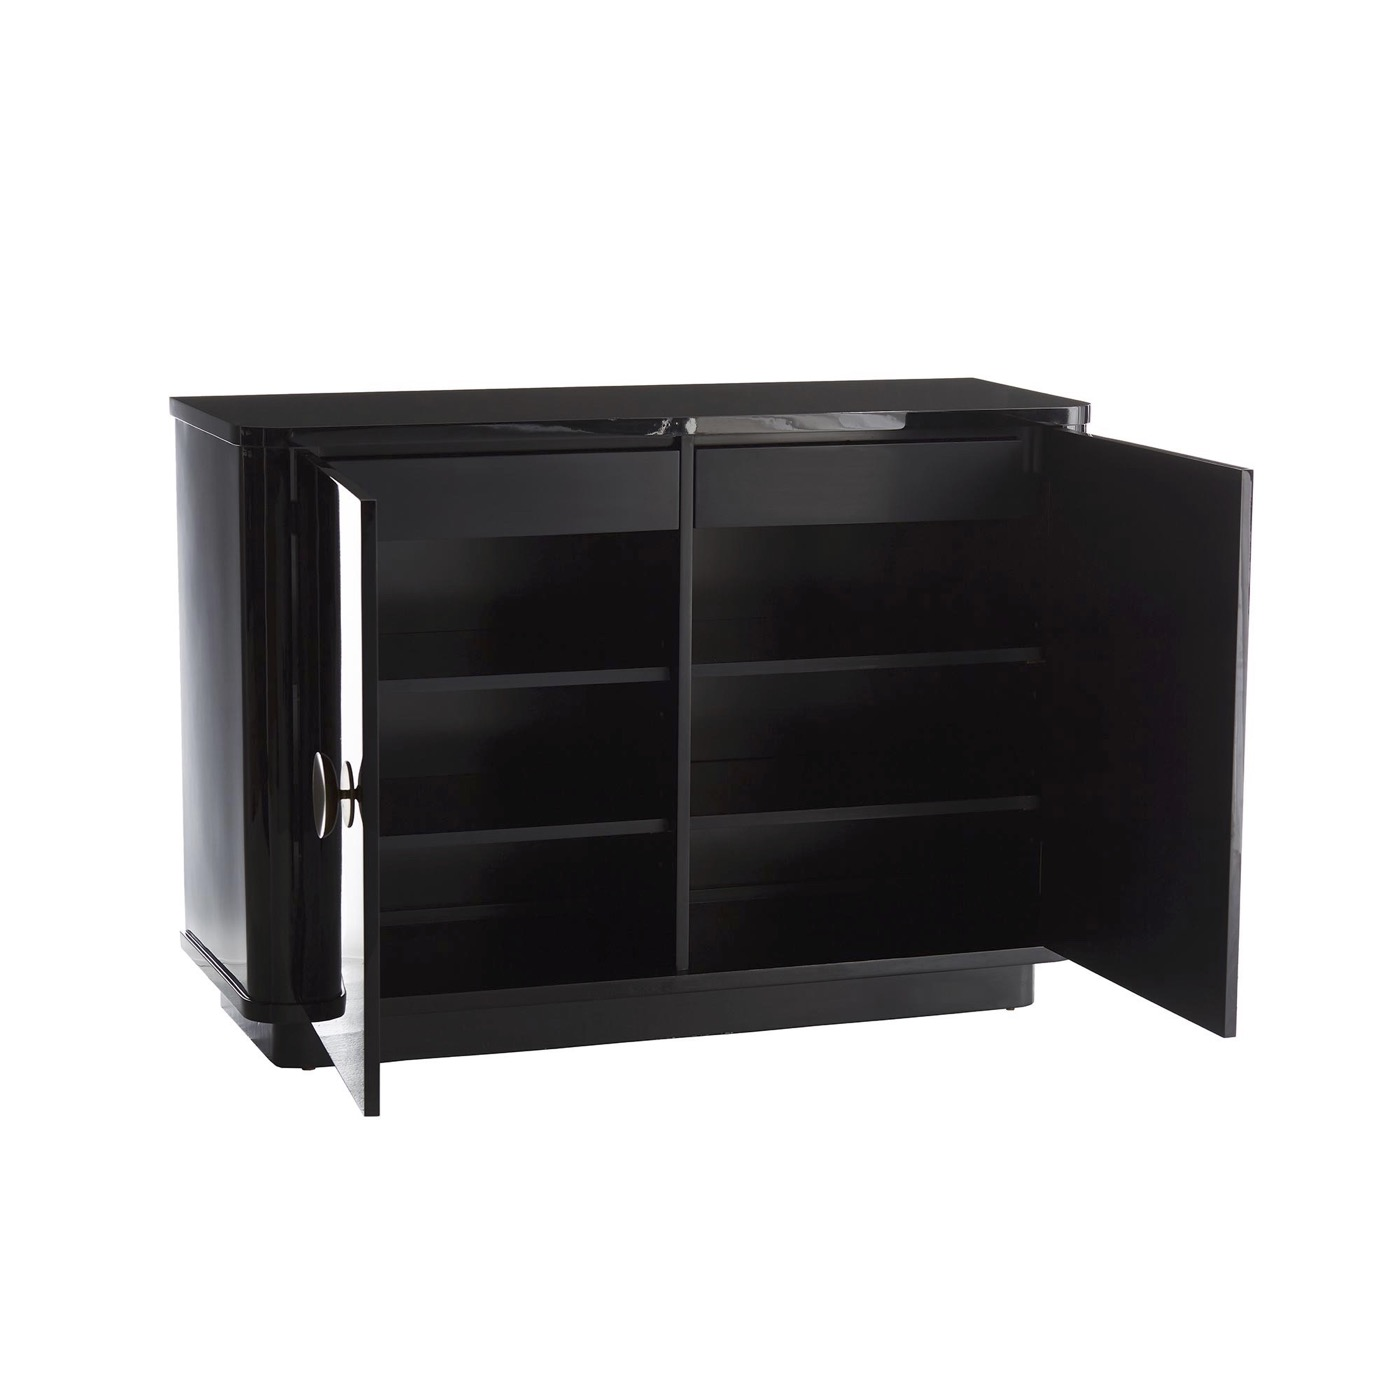 Dermot Lacquer Cabinet